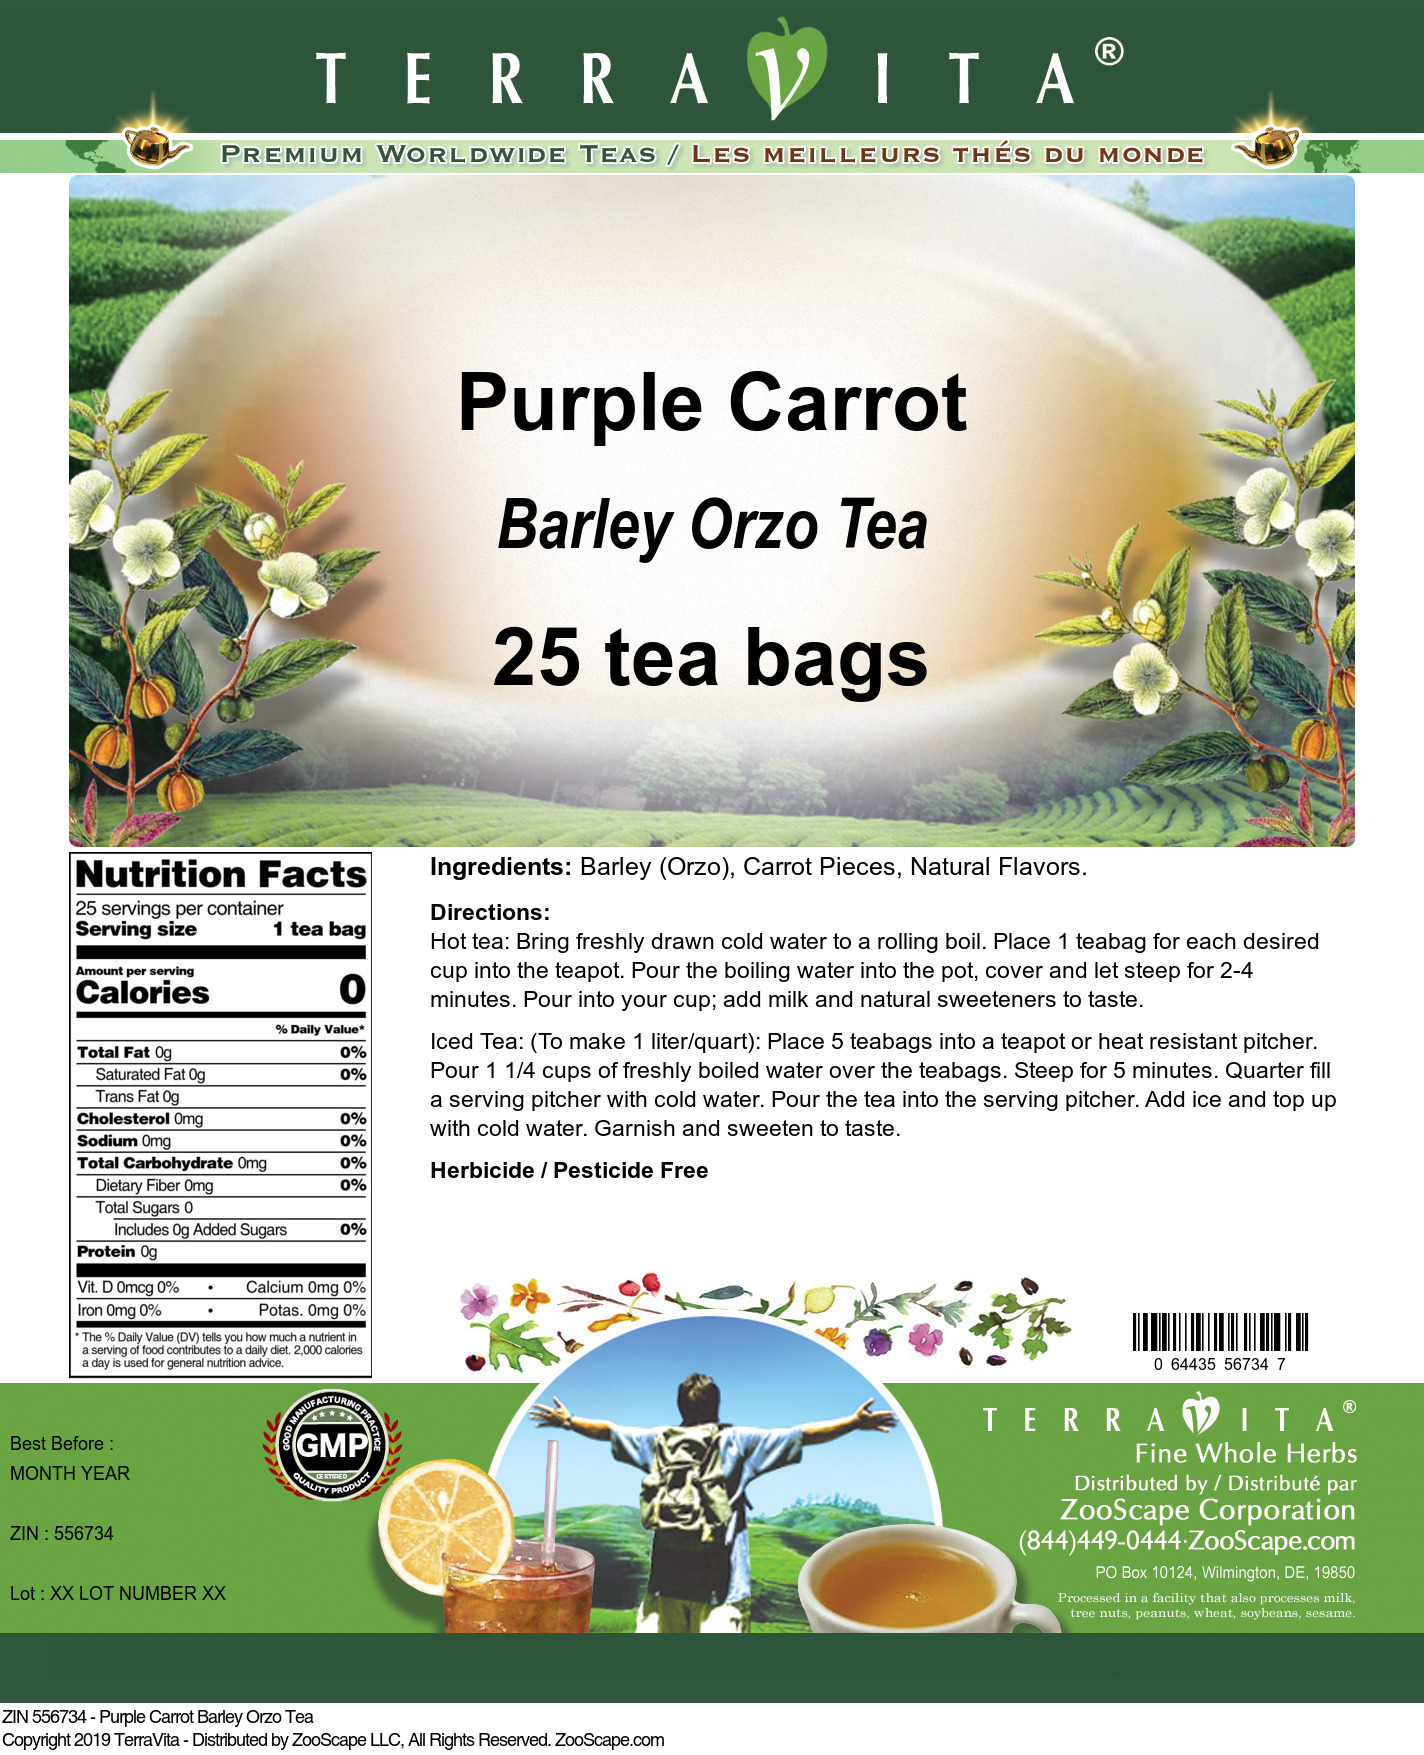 Purple Carrot Barley Orzo Tea